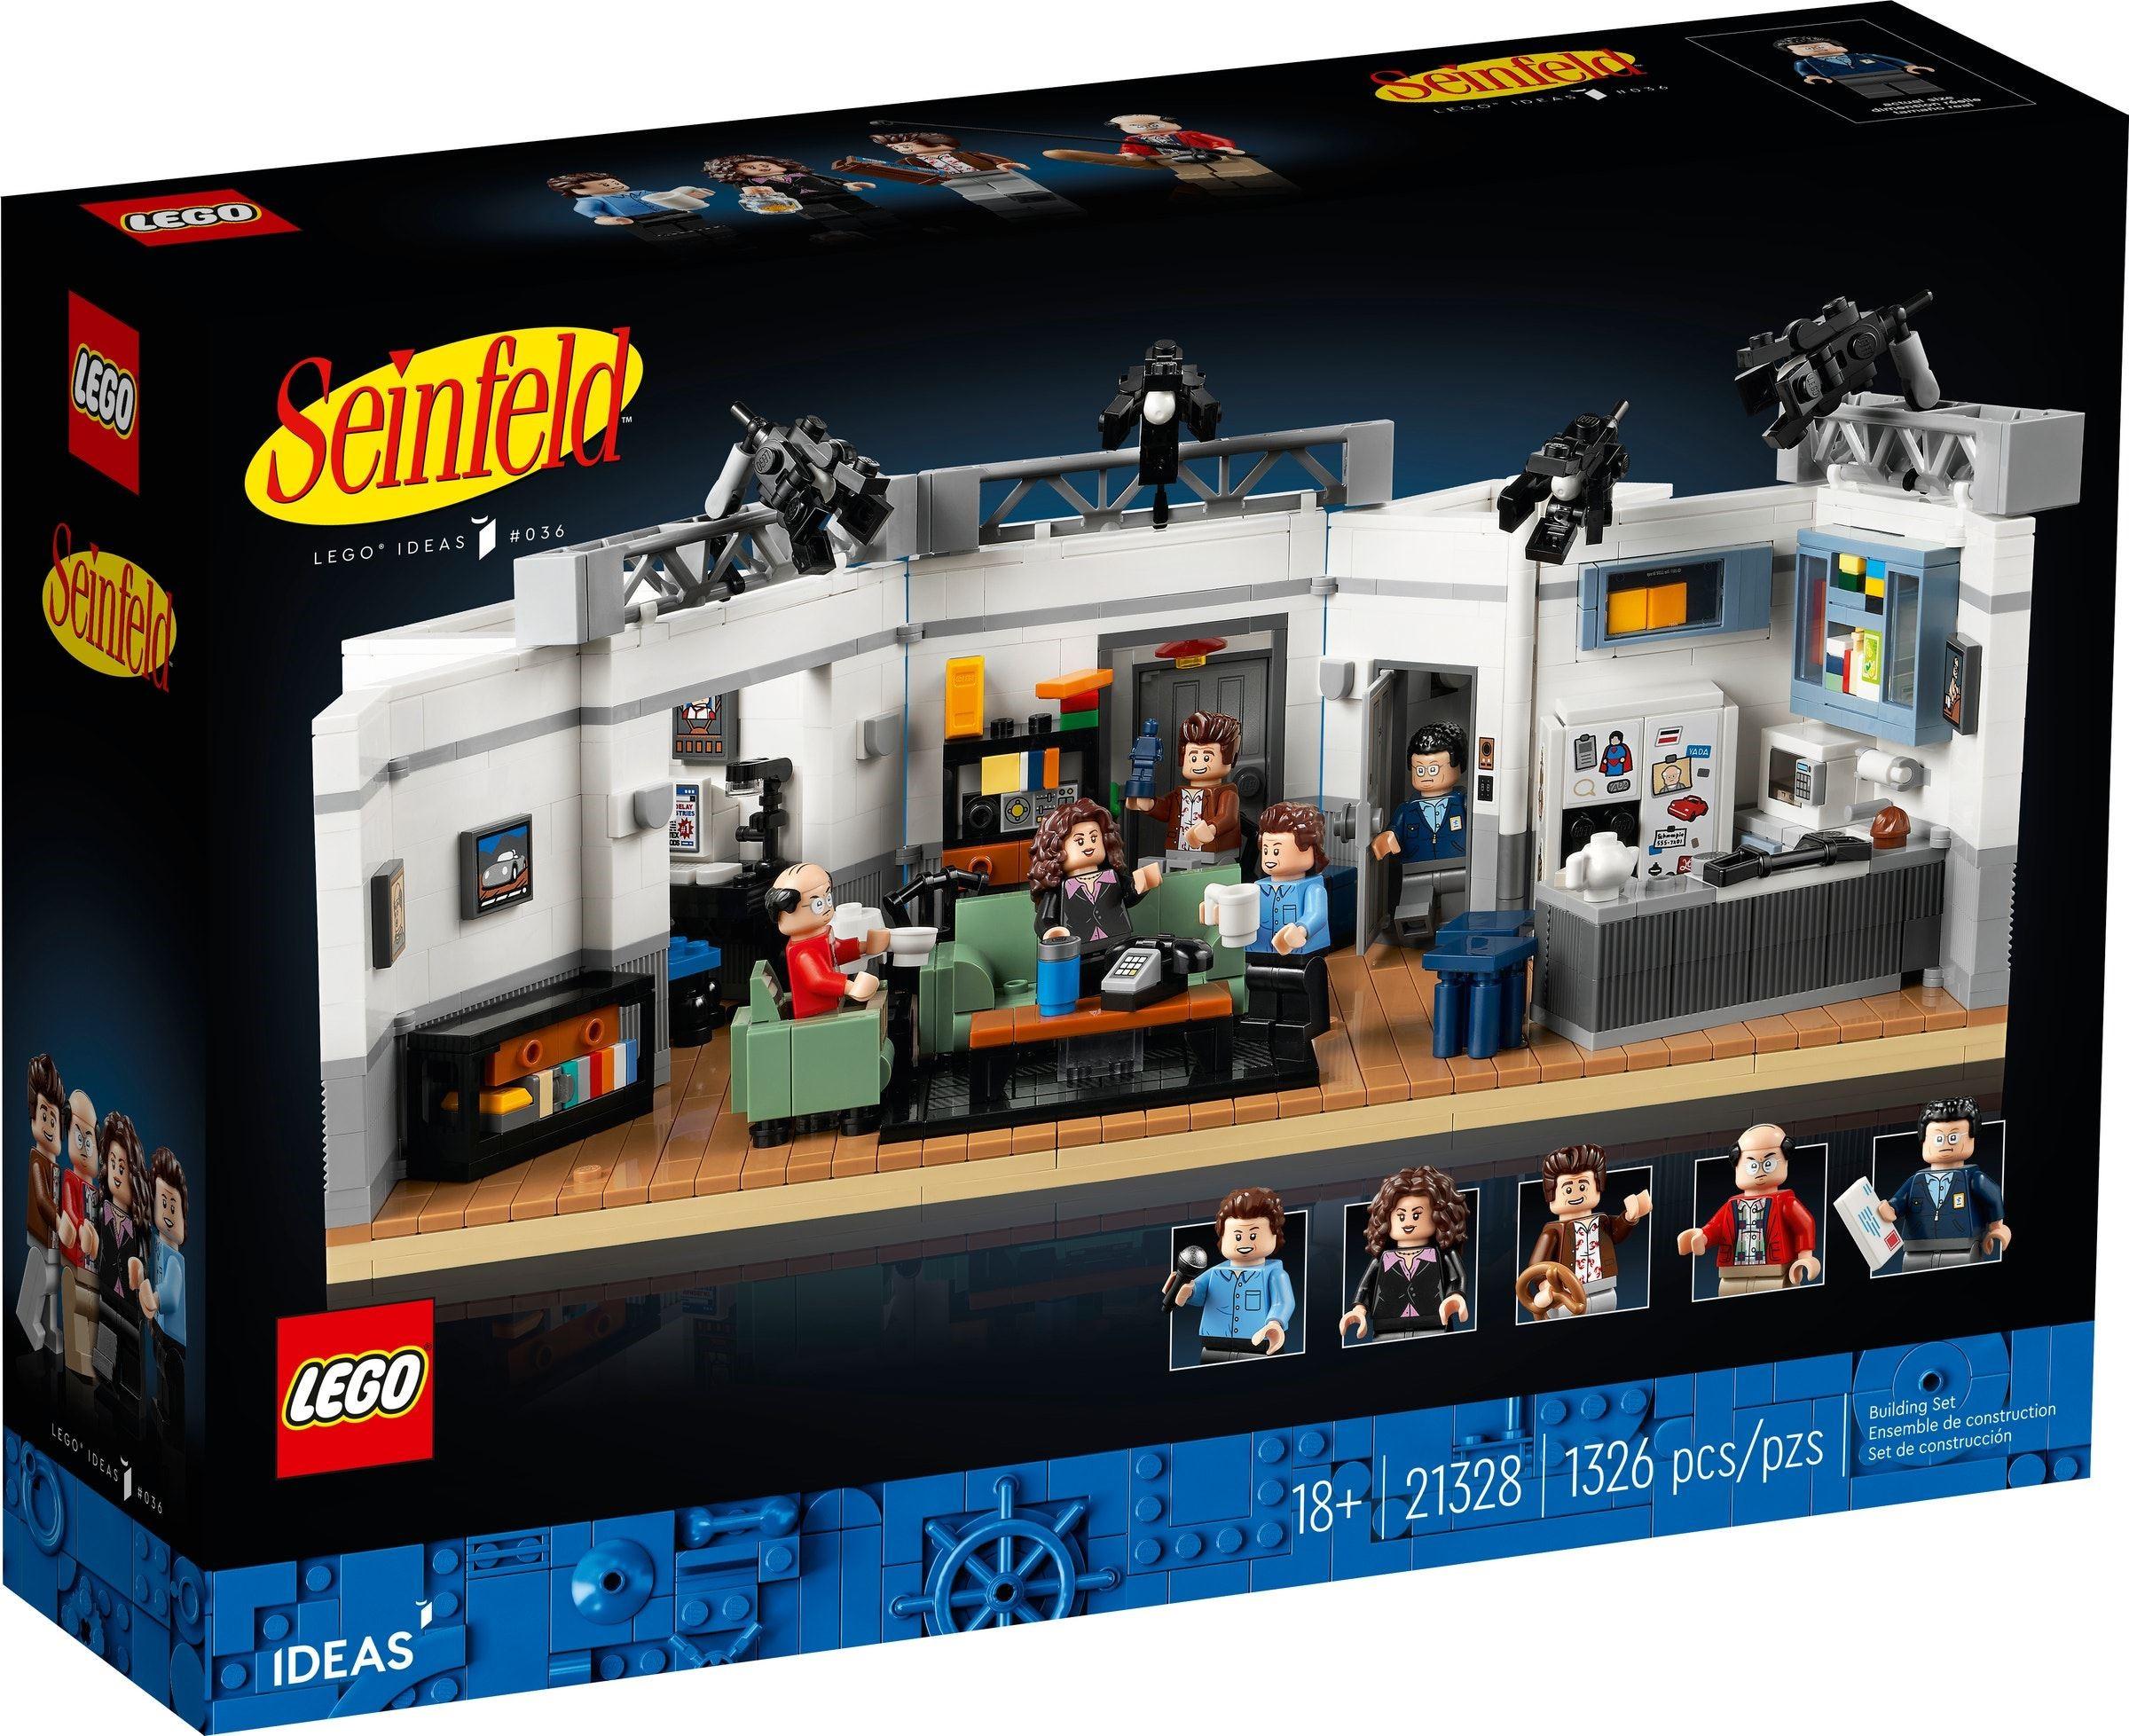 21328 LEGO Ideas Seinfeld